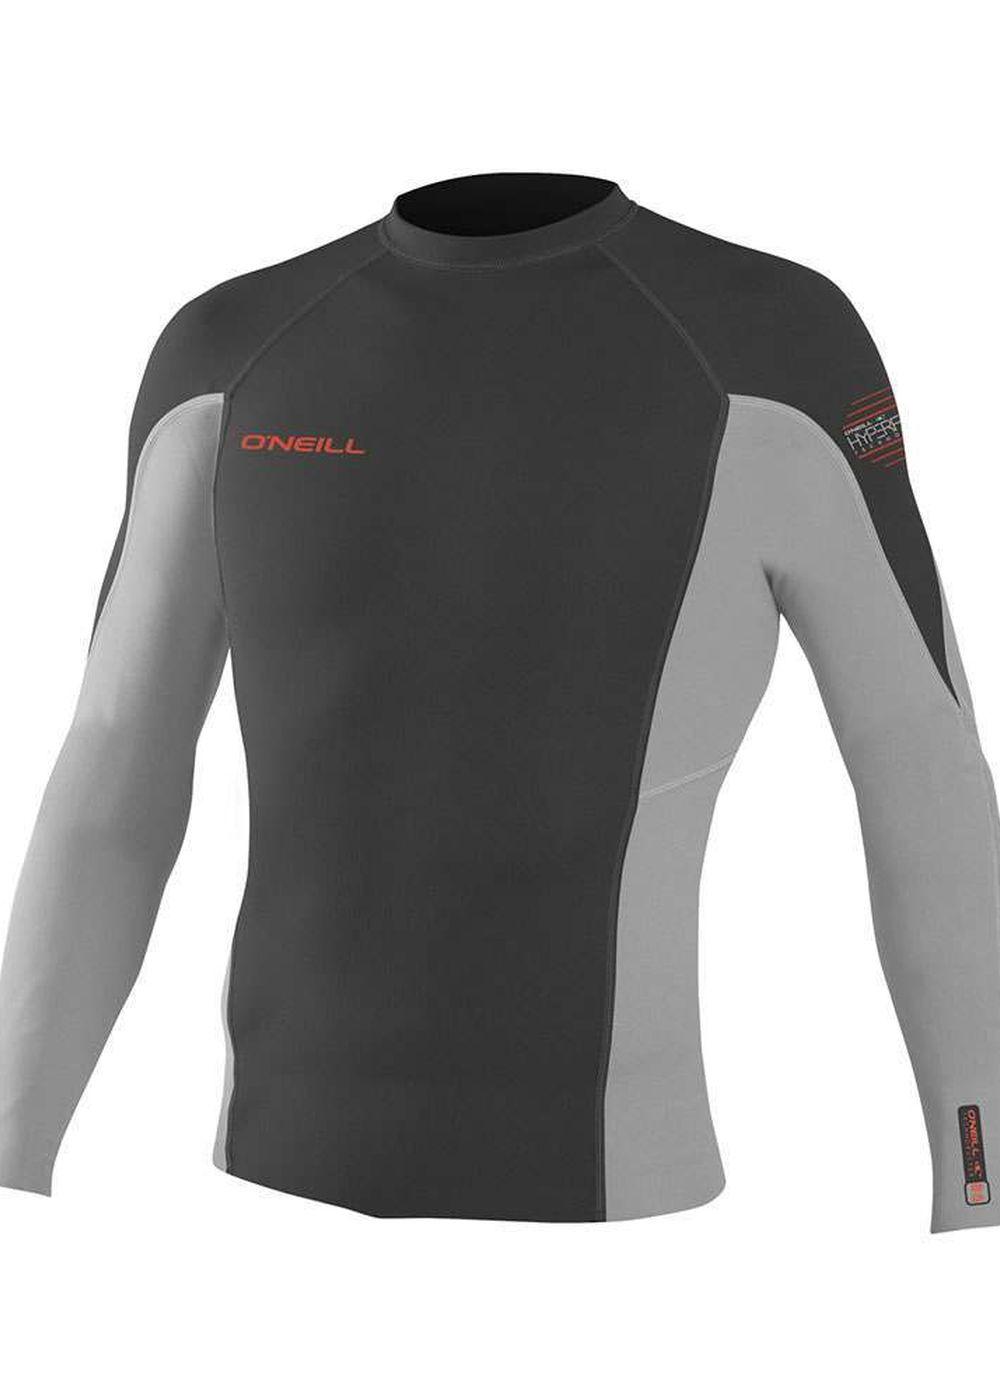 Oneill Hyperfreak 0.5mm Long Sleeve Wetsuit Top Gr Picture